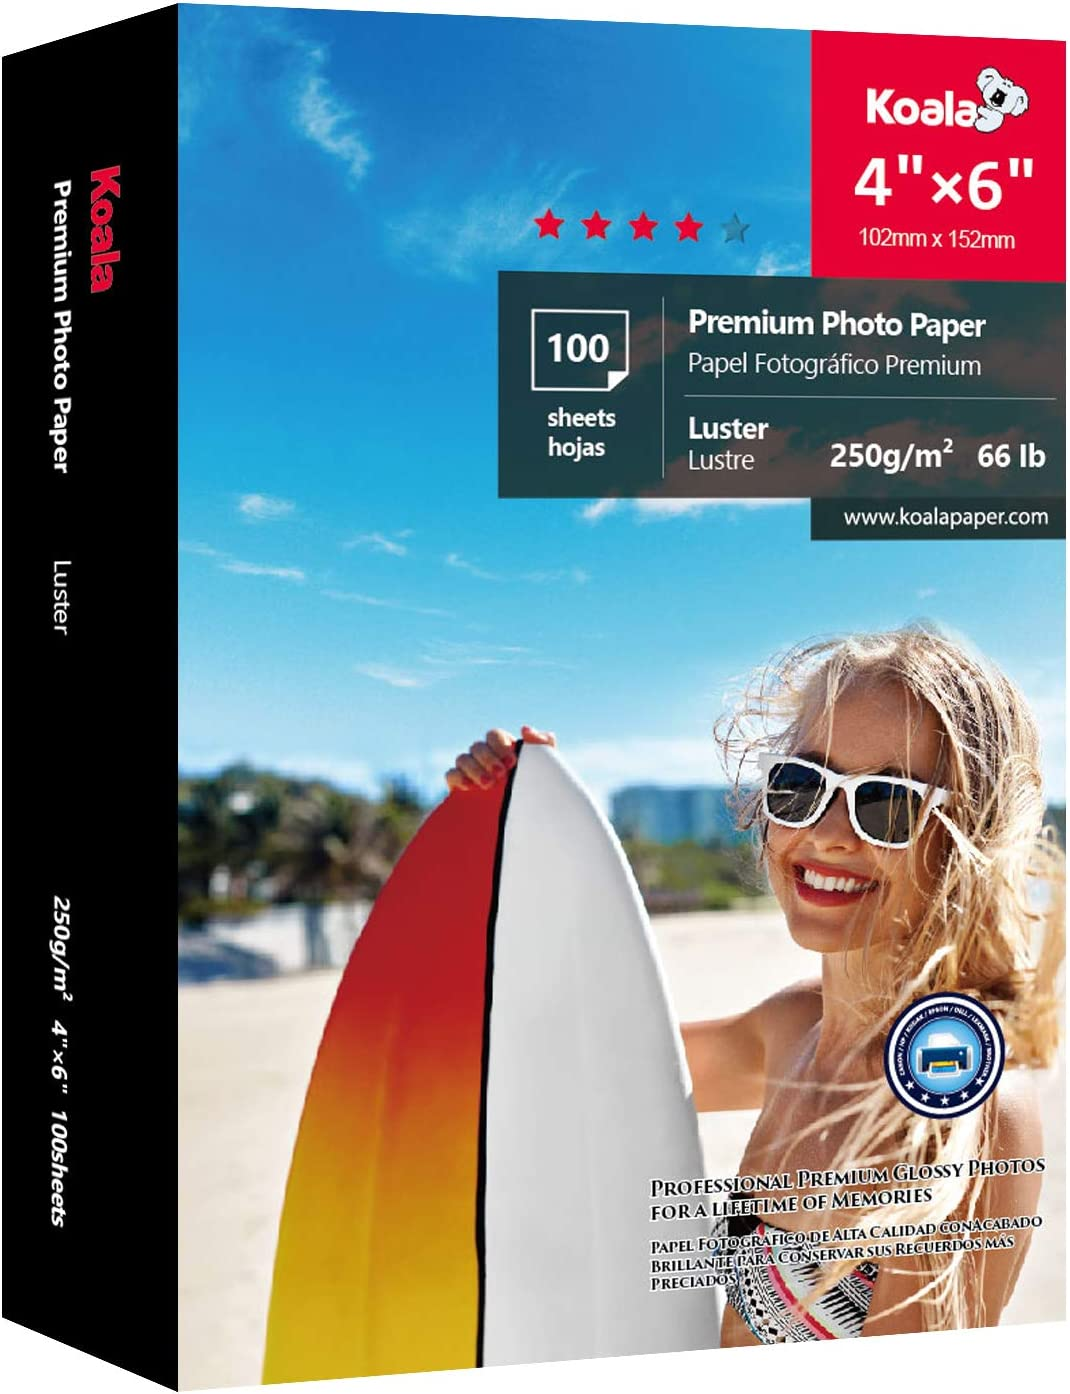 Koala Premium Photo Paper 4x6 Inch Luster Heavyweight 66lb for Inkjet Printer 100 Sheets